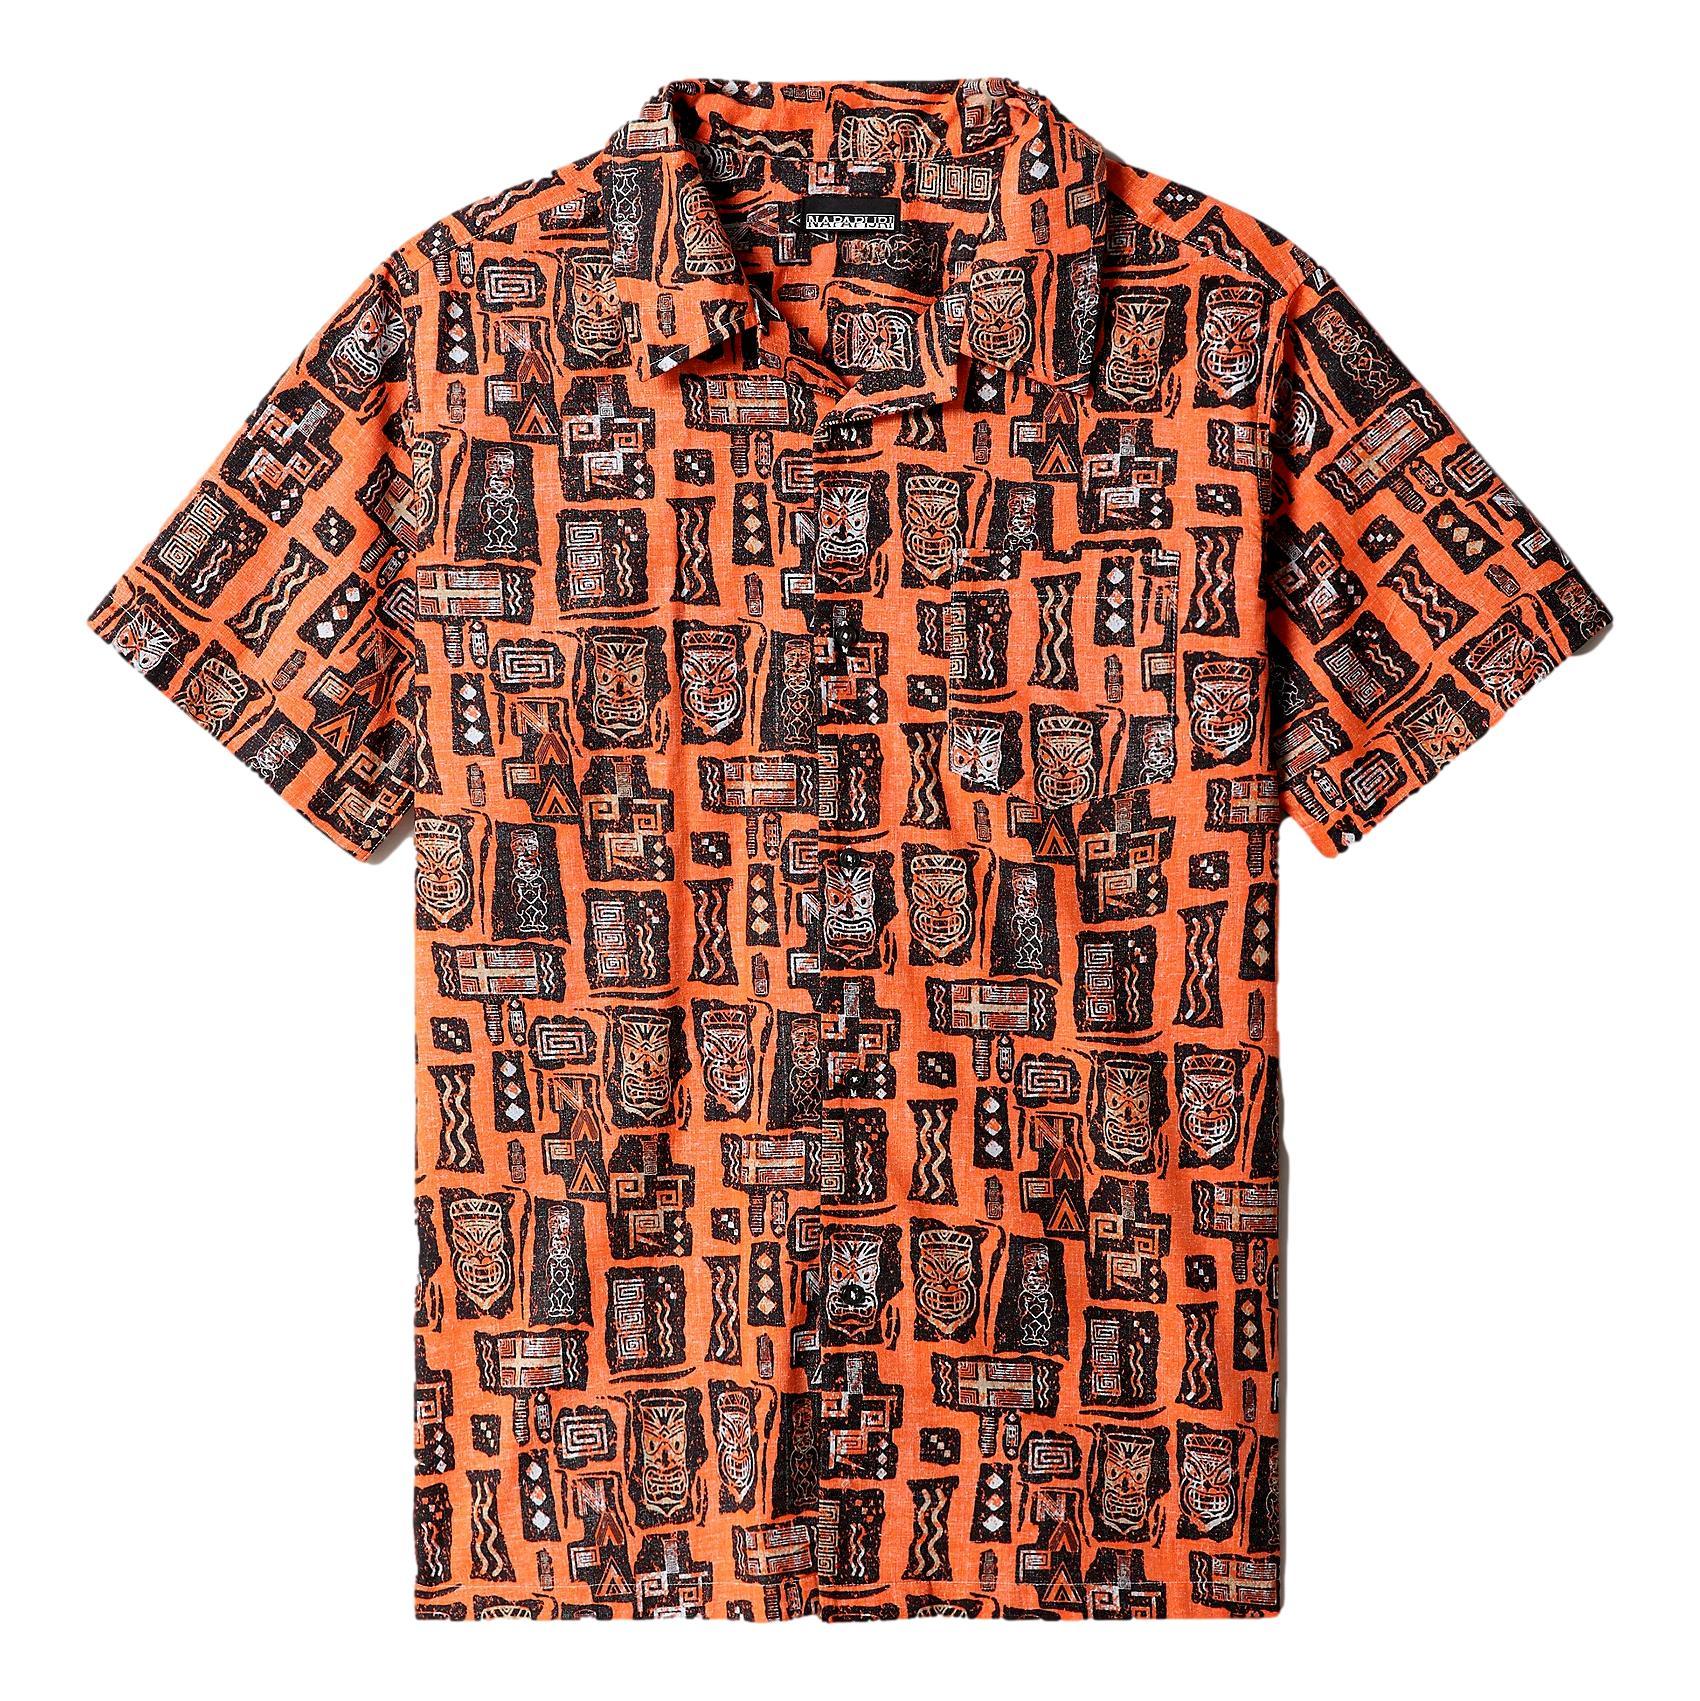 Napali short sleeve shirt NAPAPIJRI |  | NP0A4F4SF3Y1